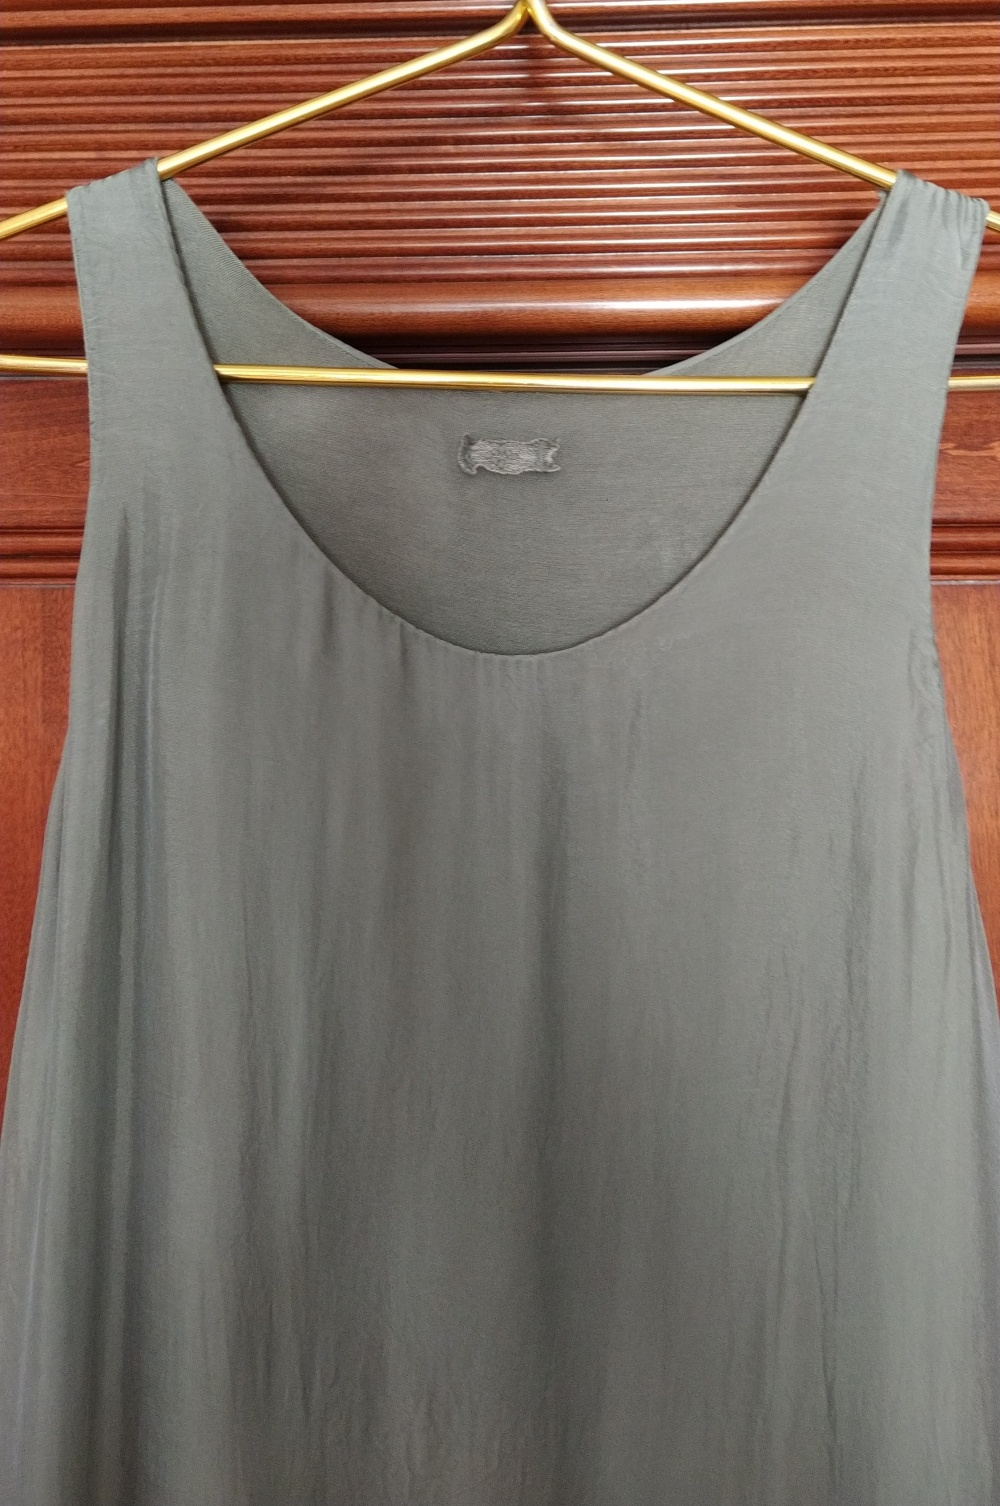 Платье no brand, L, M